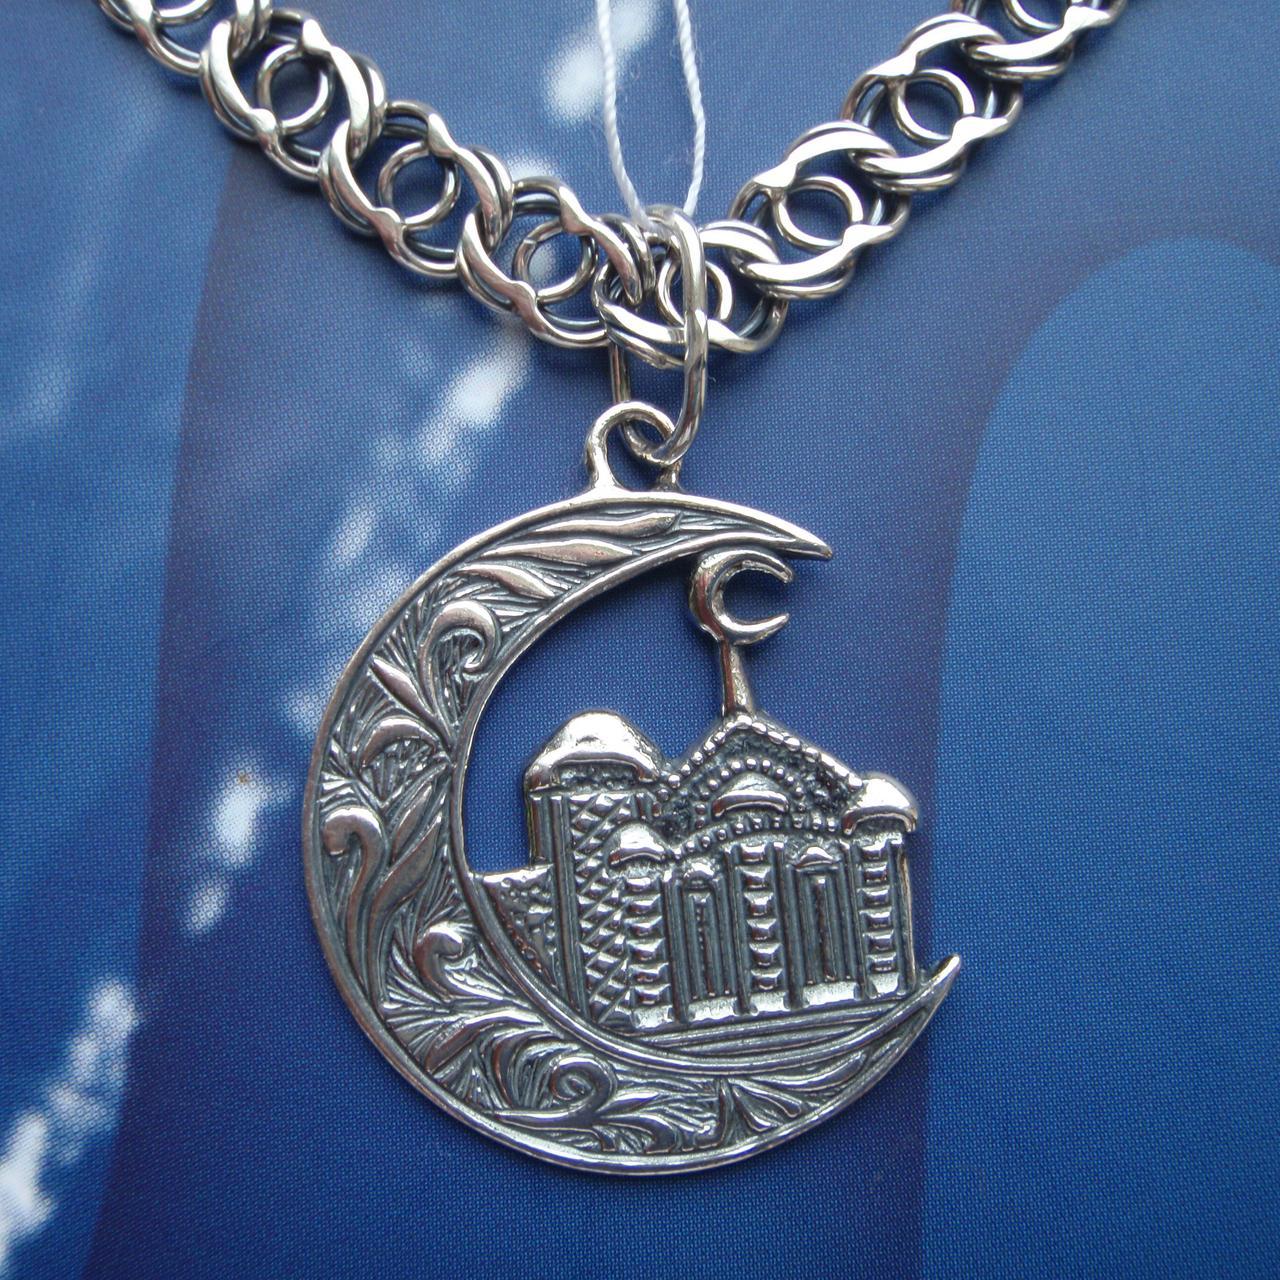 Кулон мусульманский полумесяц памятник на могилу чебоксары цена